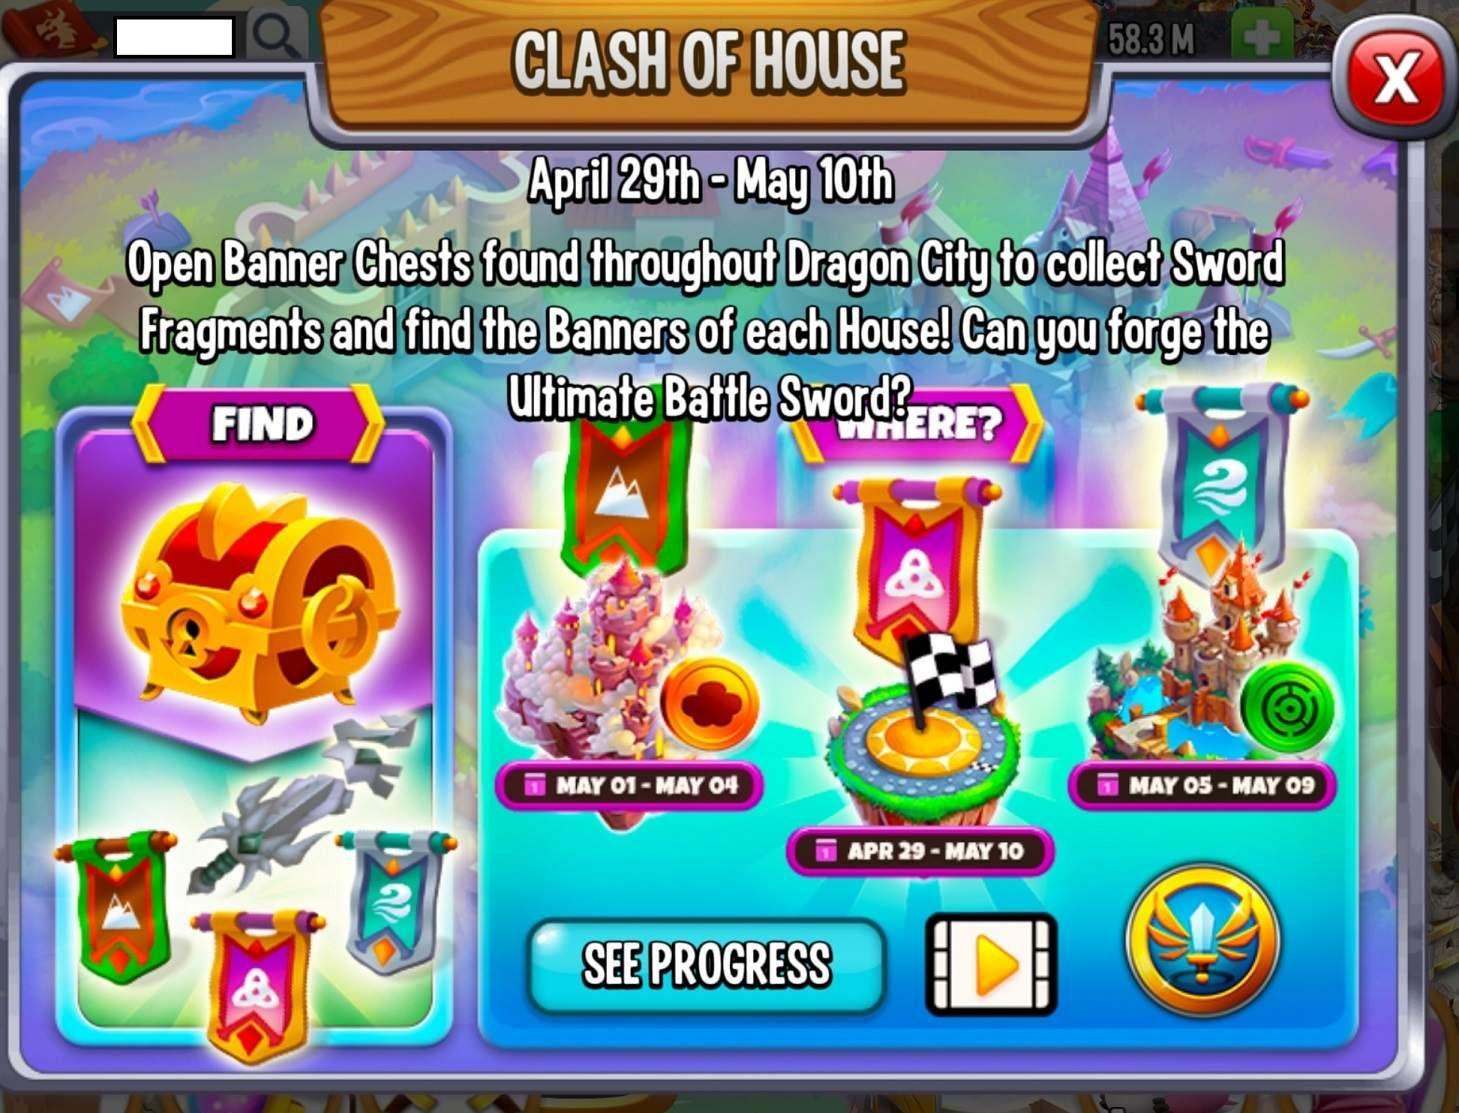 0_1619691974793_clash of house.jpg